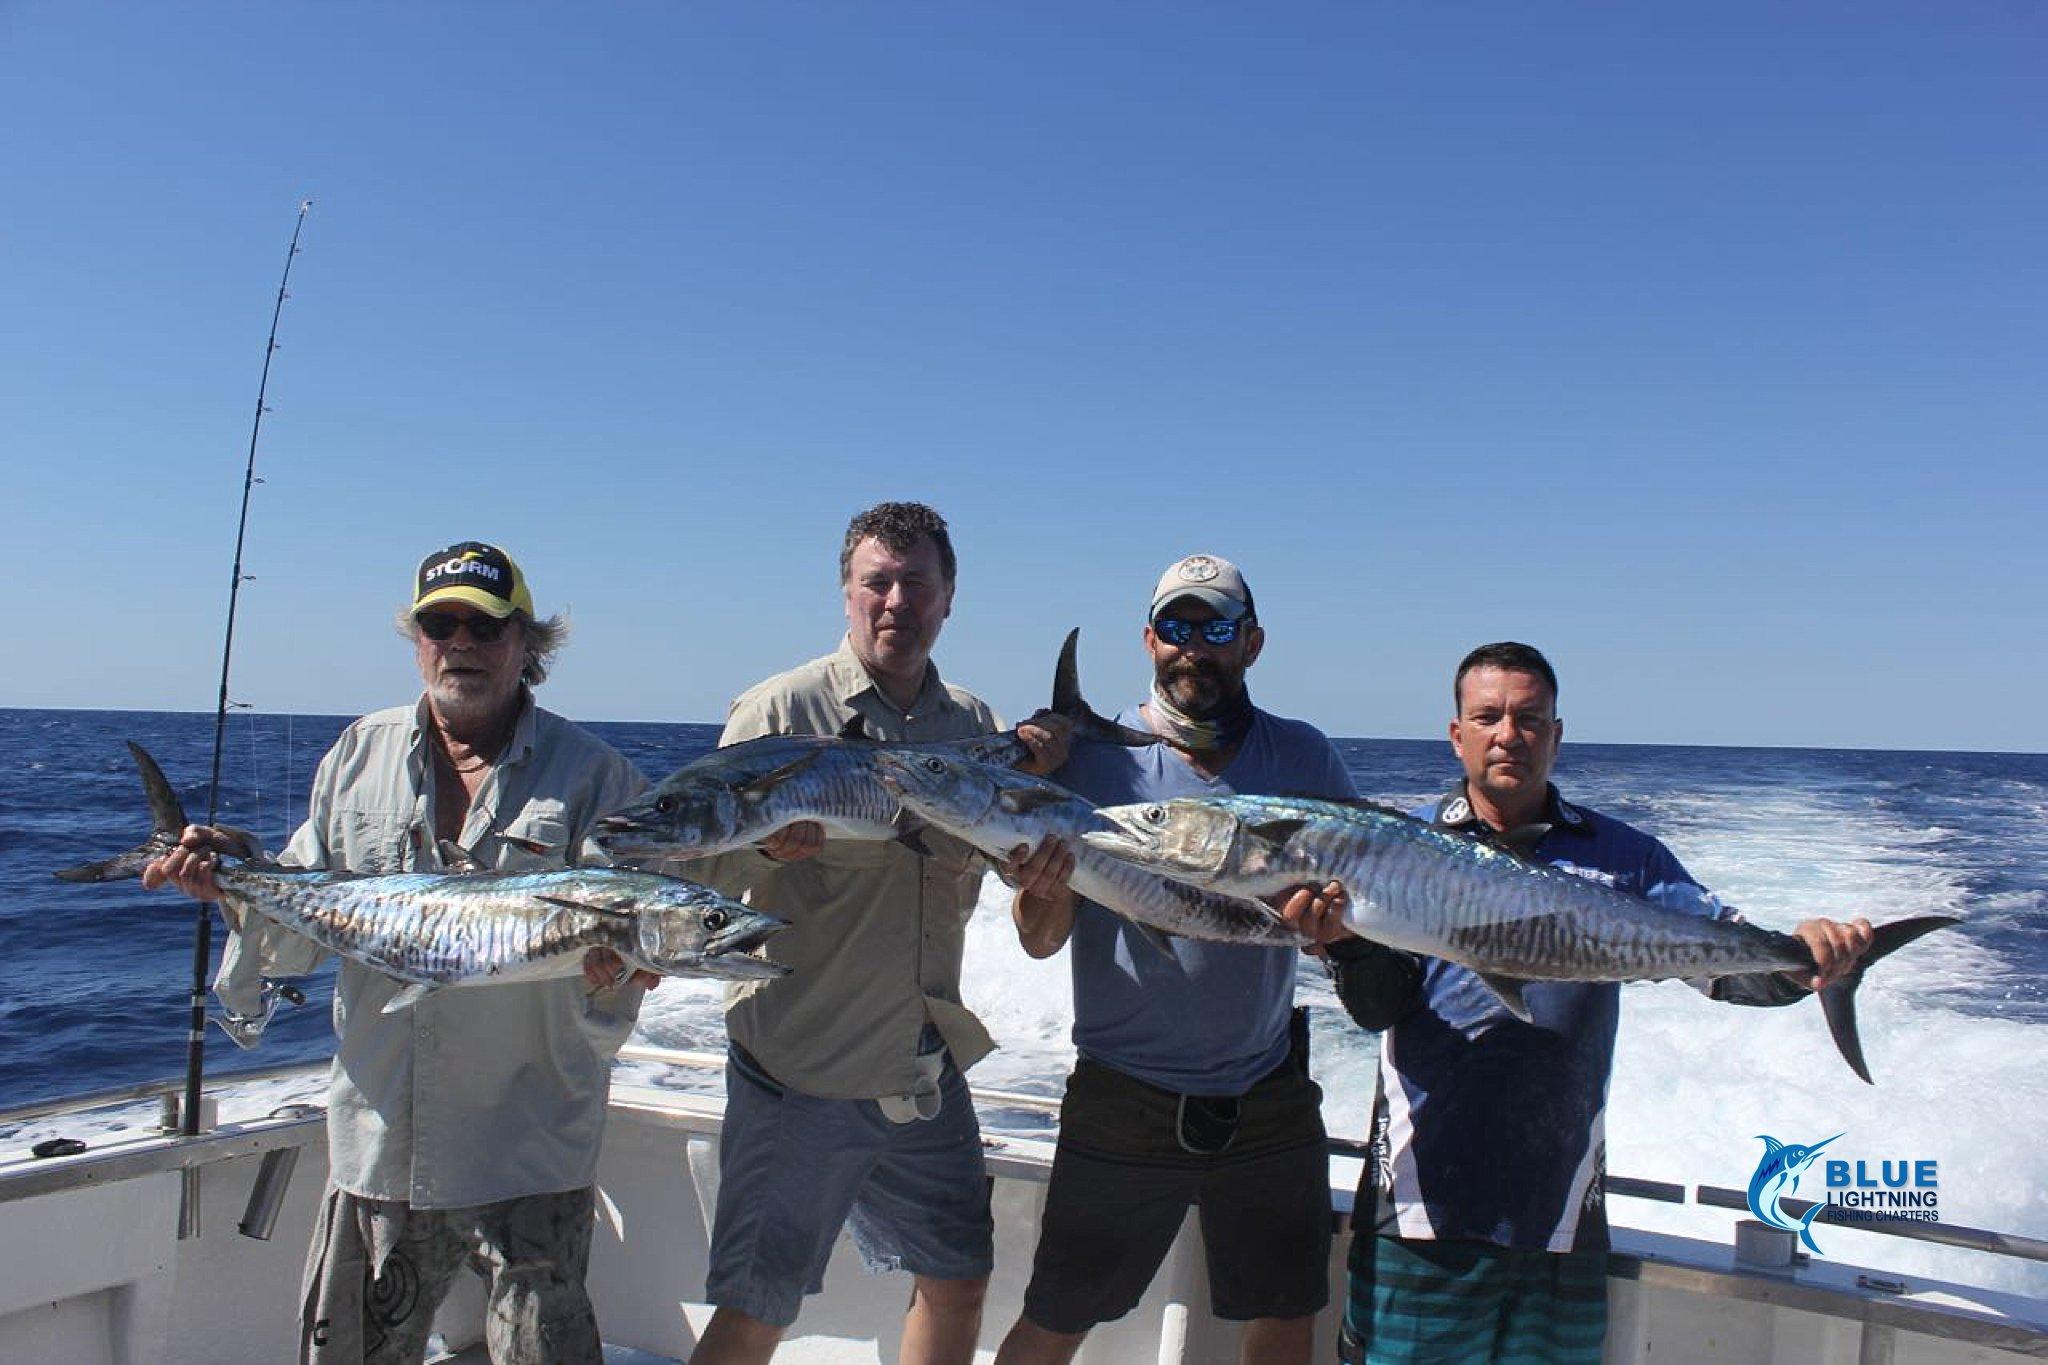 Blue lightning fishing charters wa blue lightning for Washington fishing charters